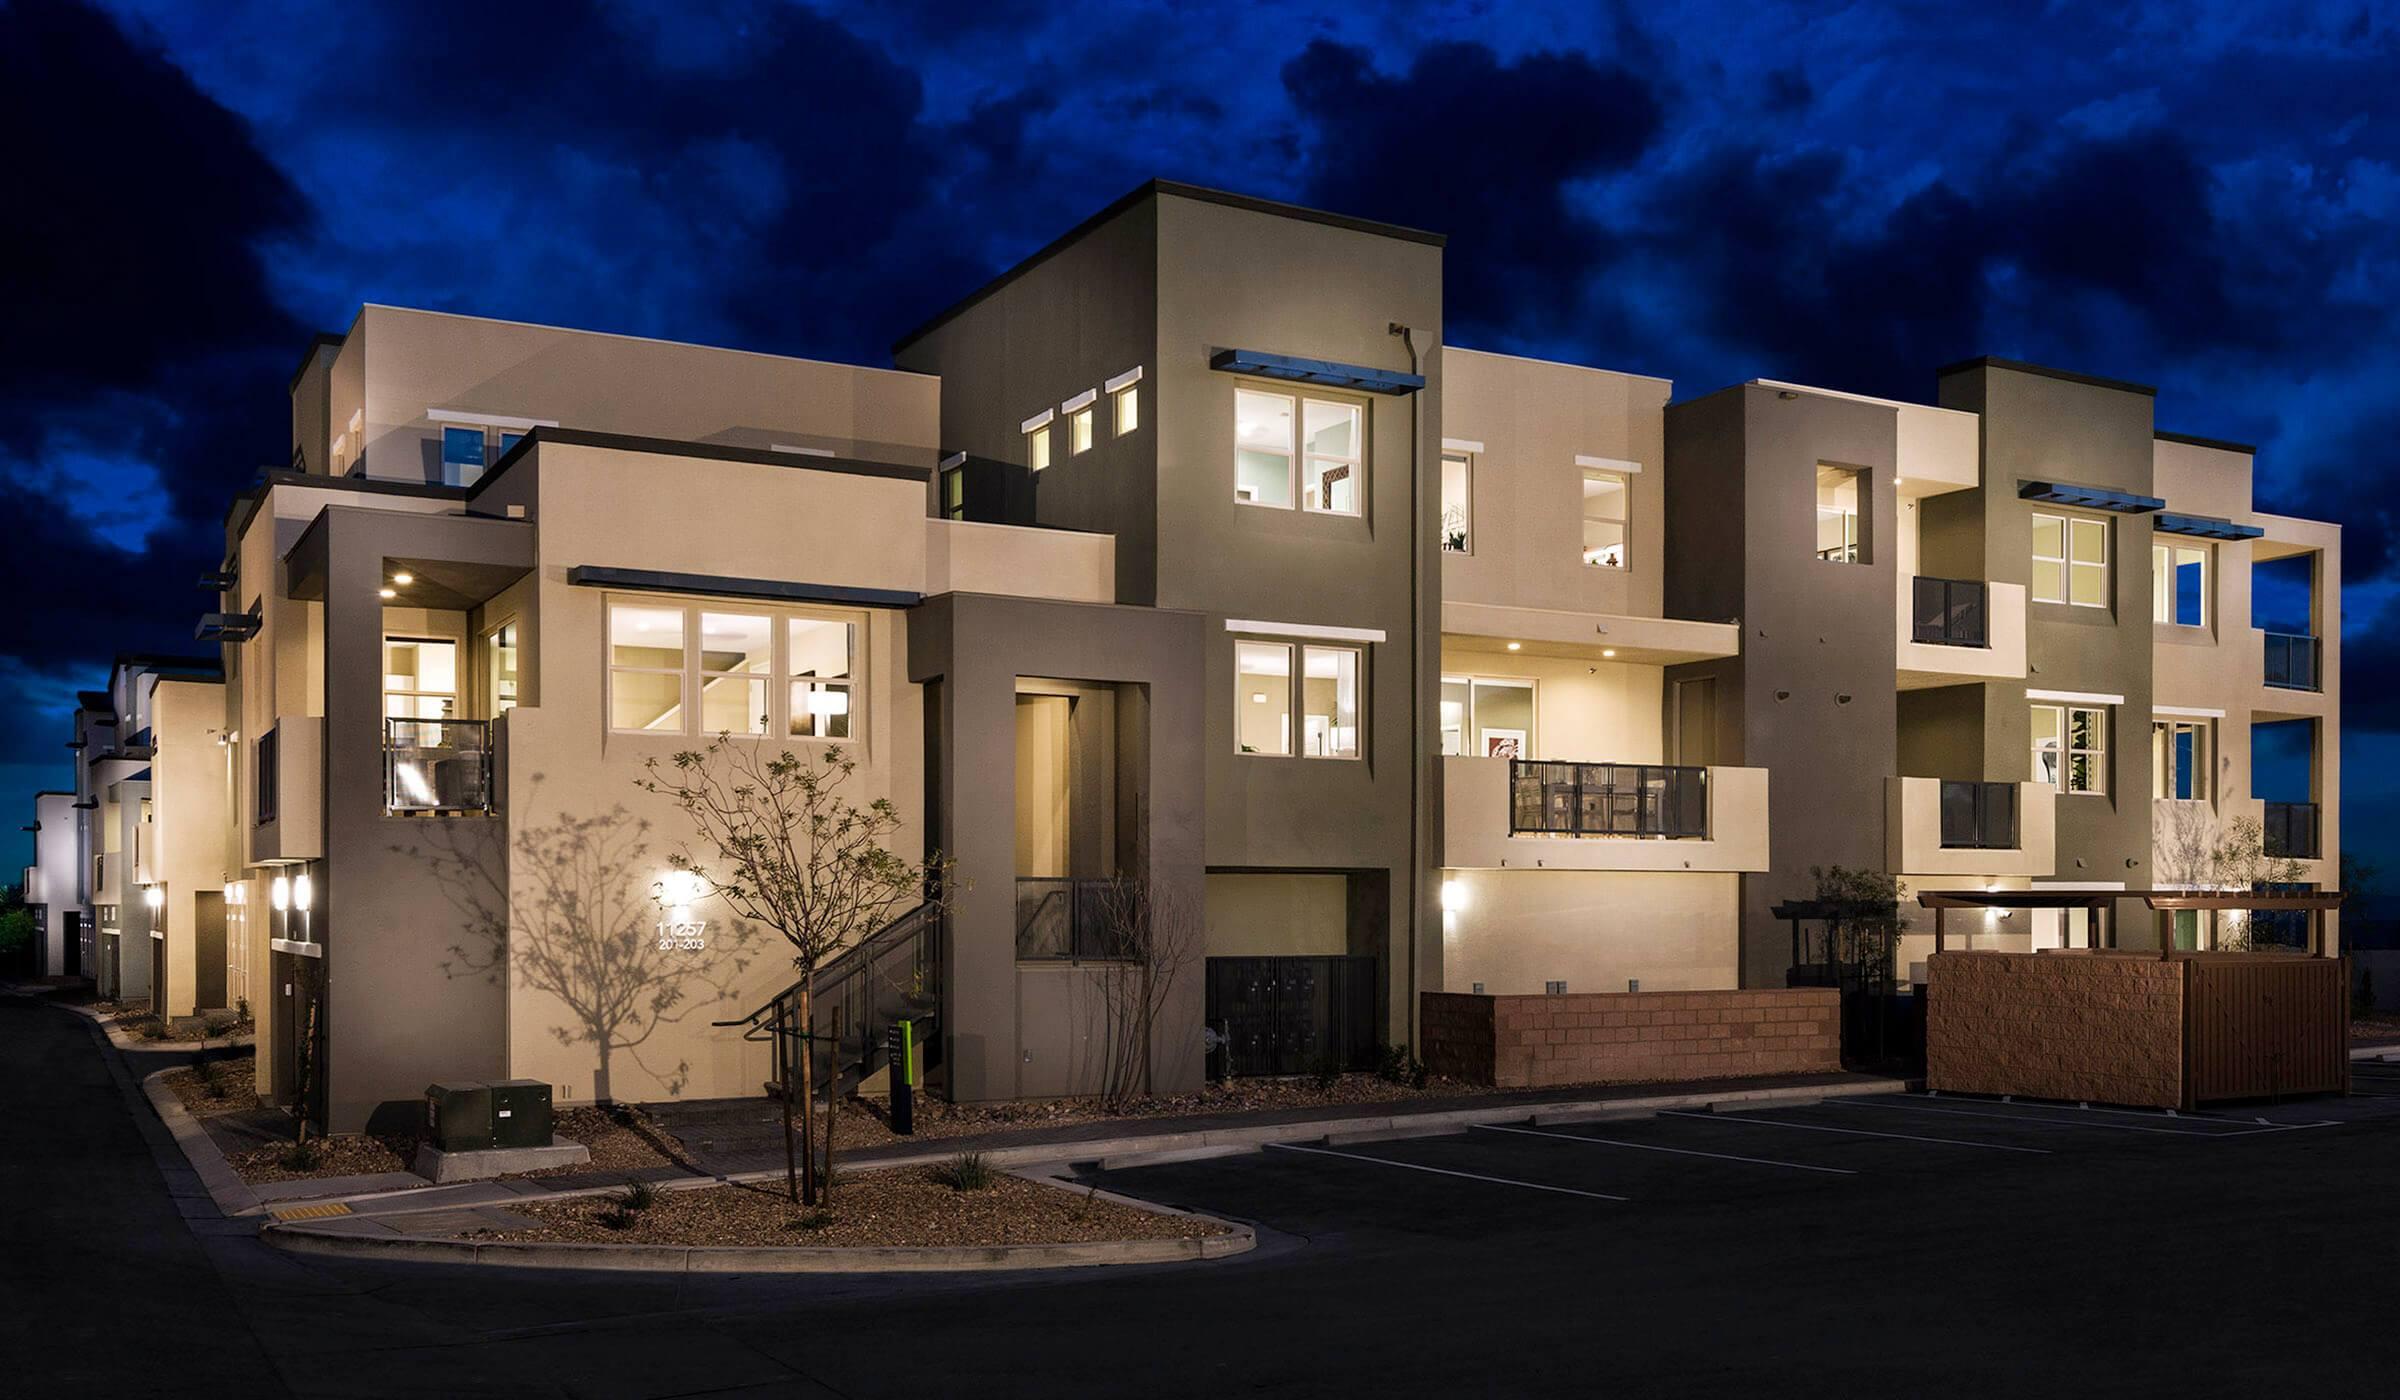 Moda unit 5 plan las vegas nevada 89135 moda unit 5 for Las vegas home source